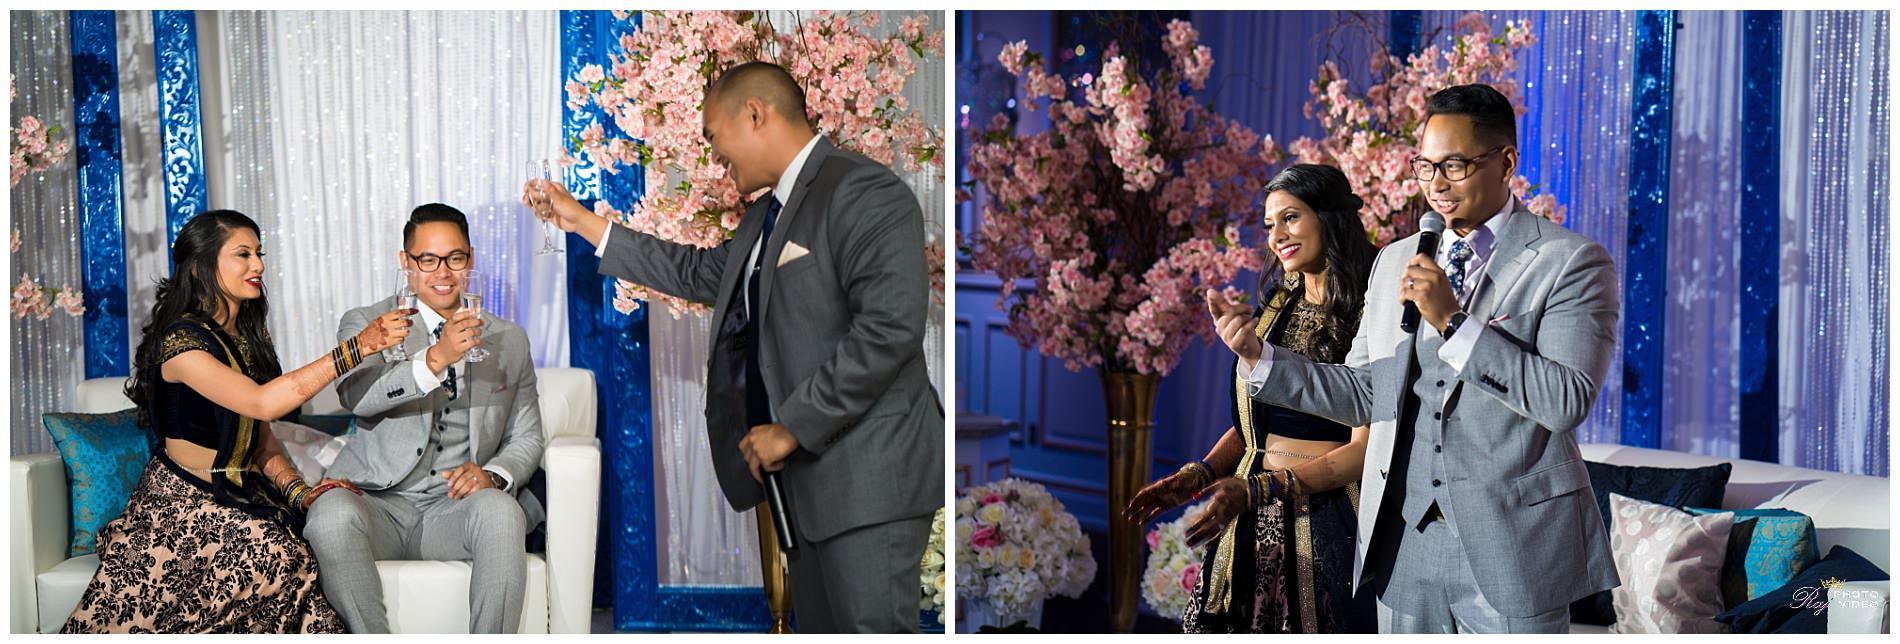 Royal-Manor-Garfield-NJ-Christian-Wedding-Ceremony-Khusbu-Jeff-74.jpg